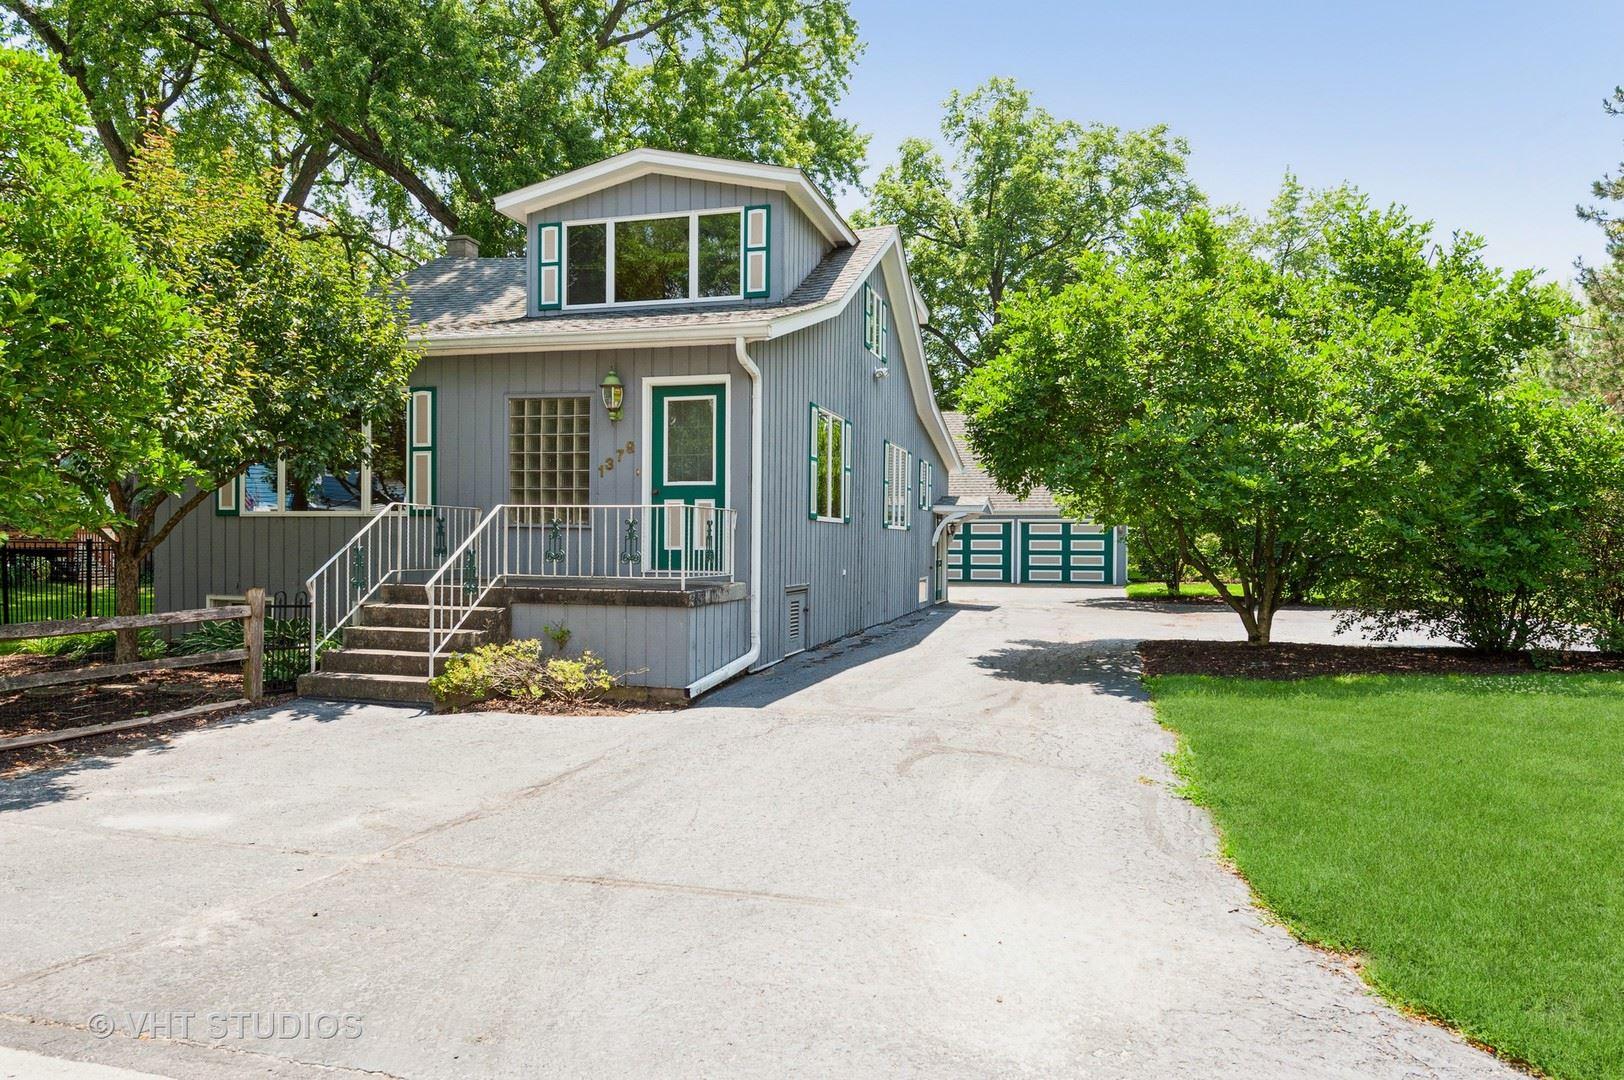 1379 Dolo Rosa Vista Lane, Crystal Lake, IL 60014 - #: 11157476